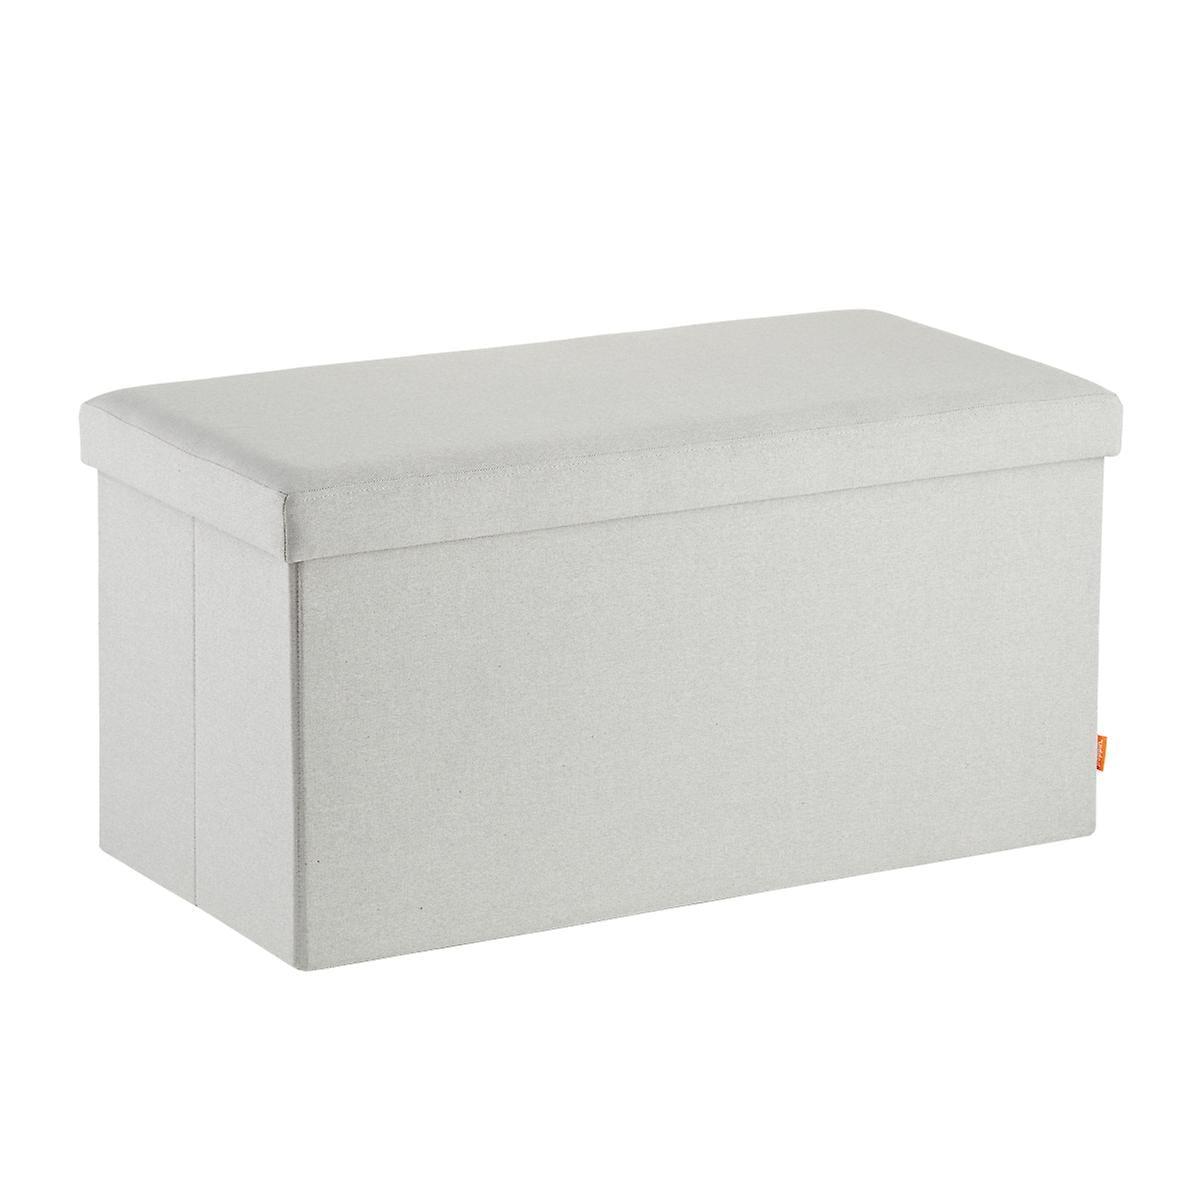 Poppin Box Bench Light